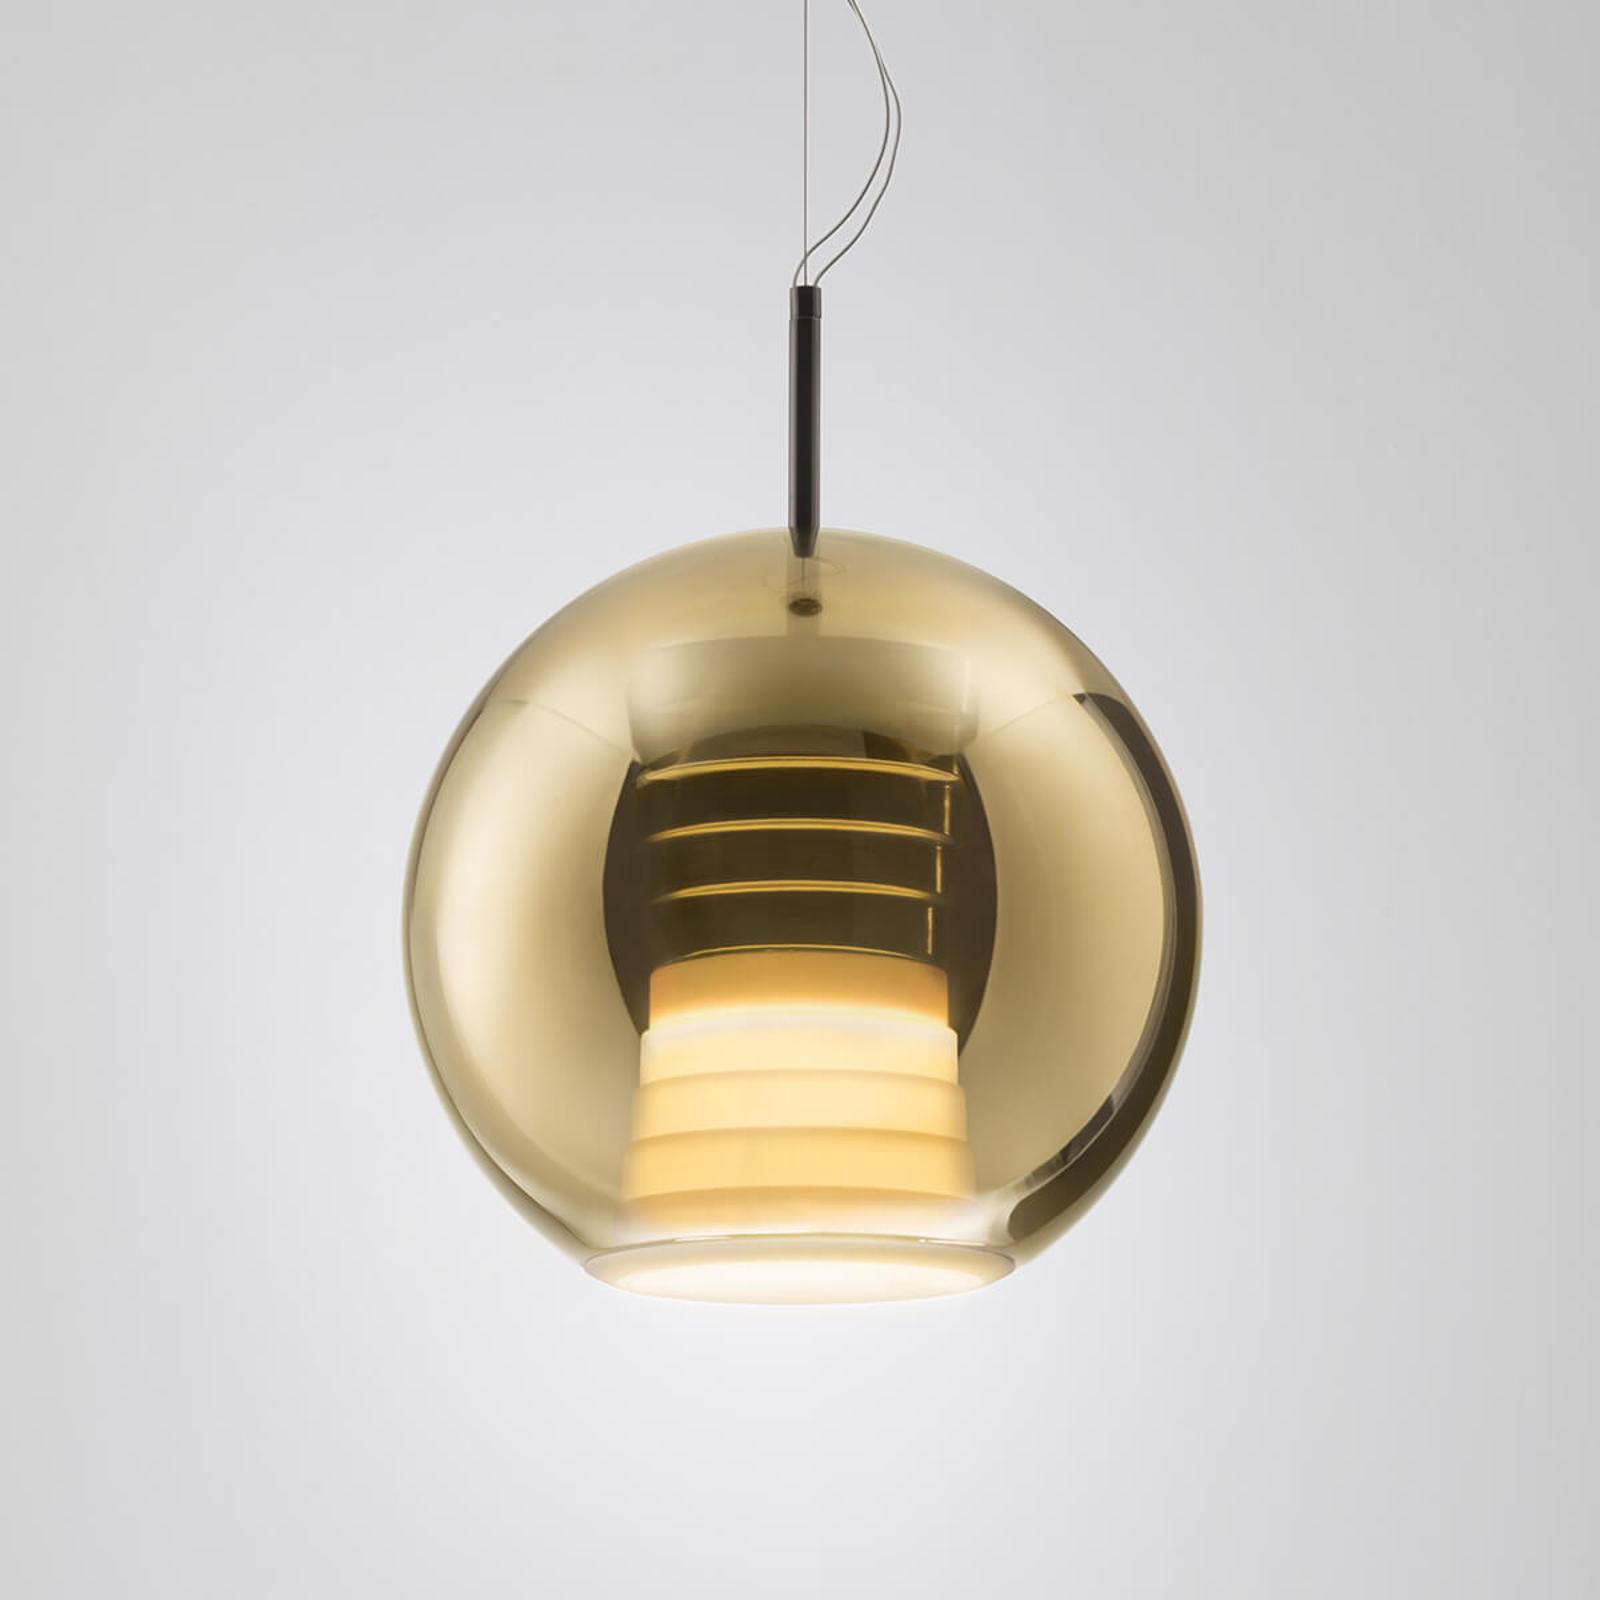 Fabbian Beluga Royal - LED-Hängeleuchte gold 30cm